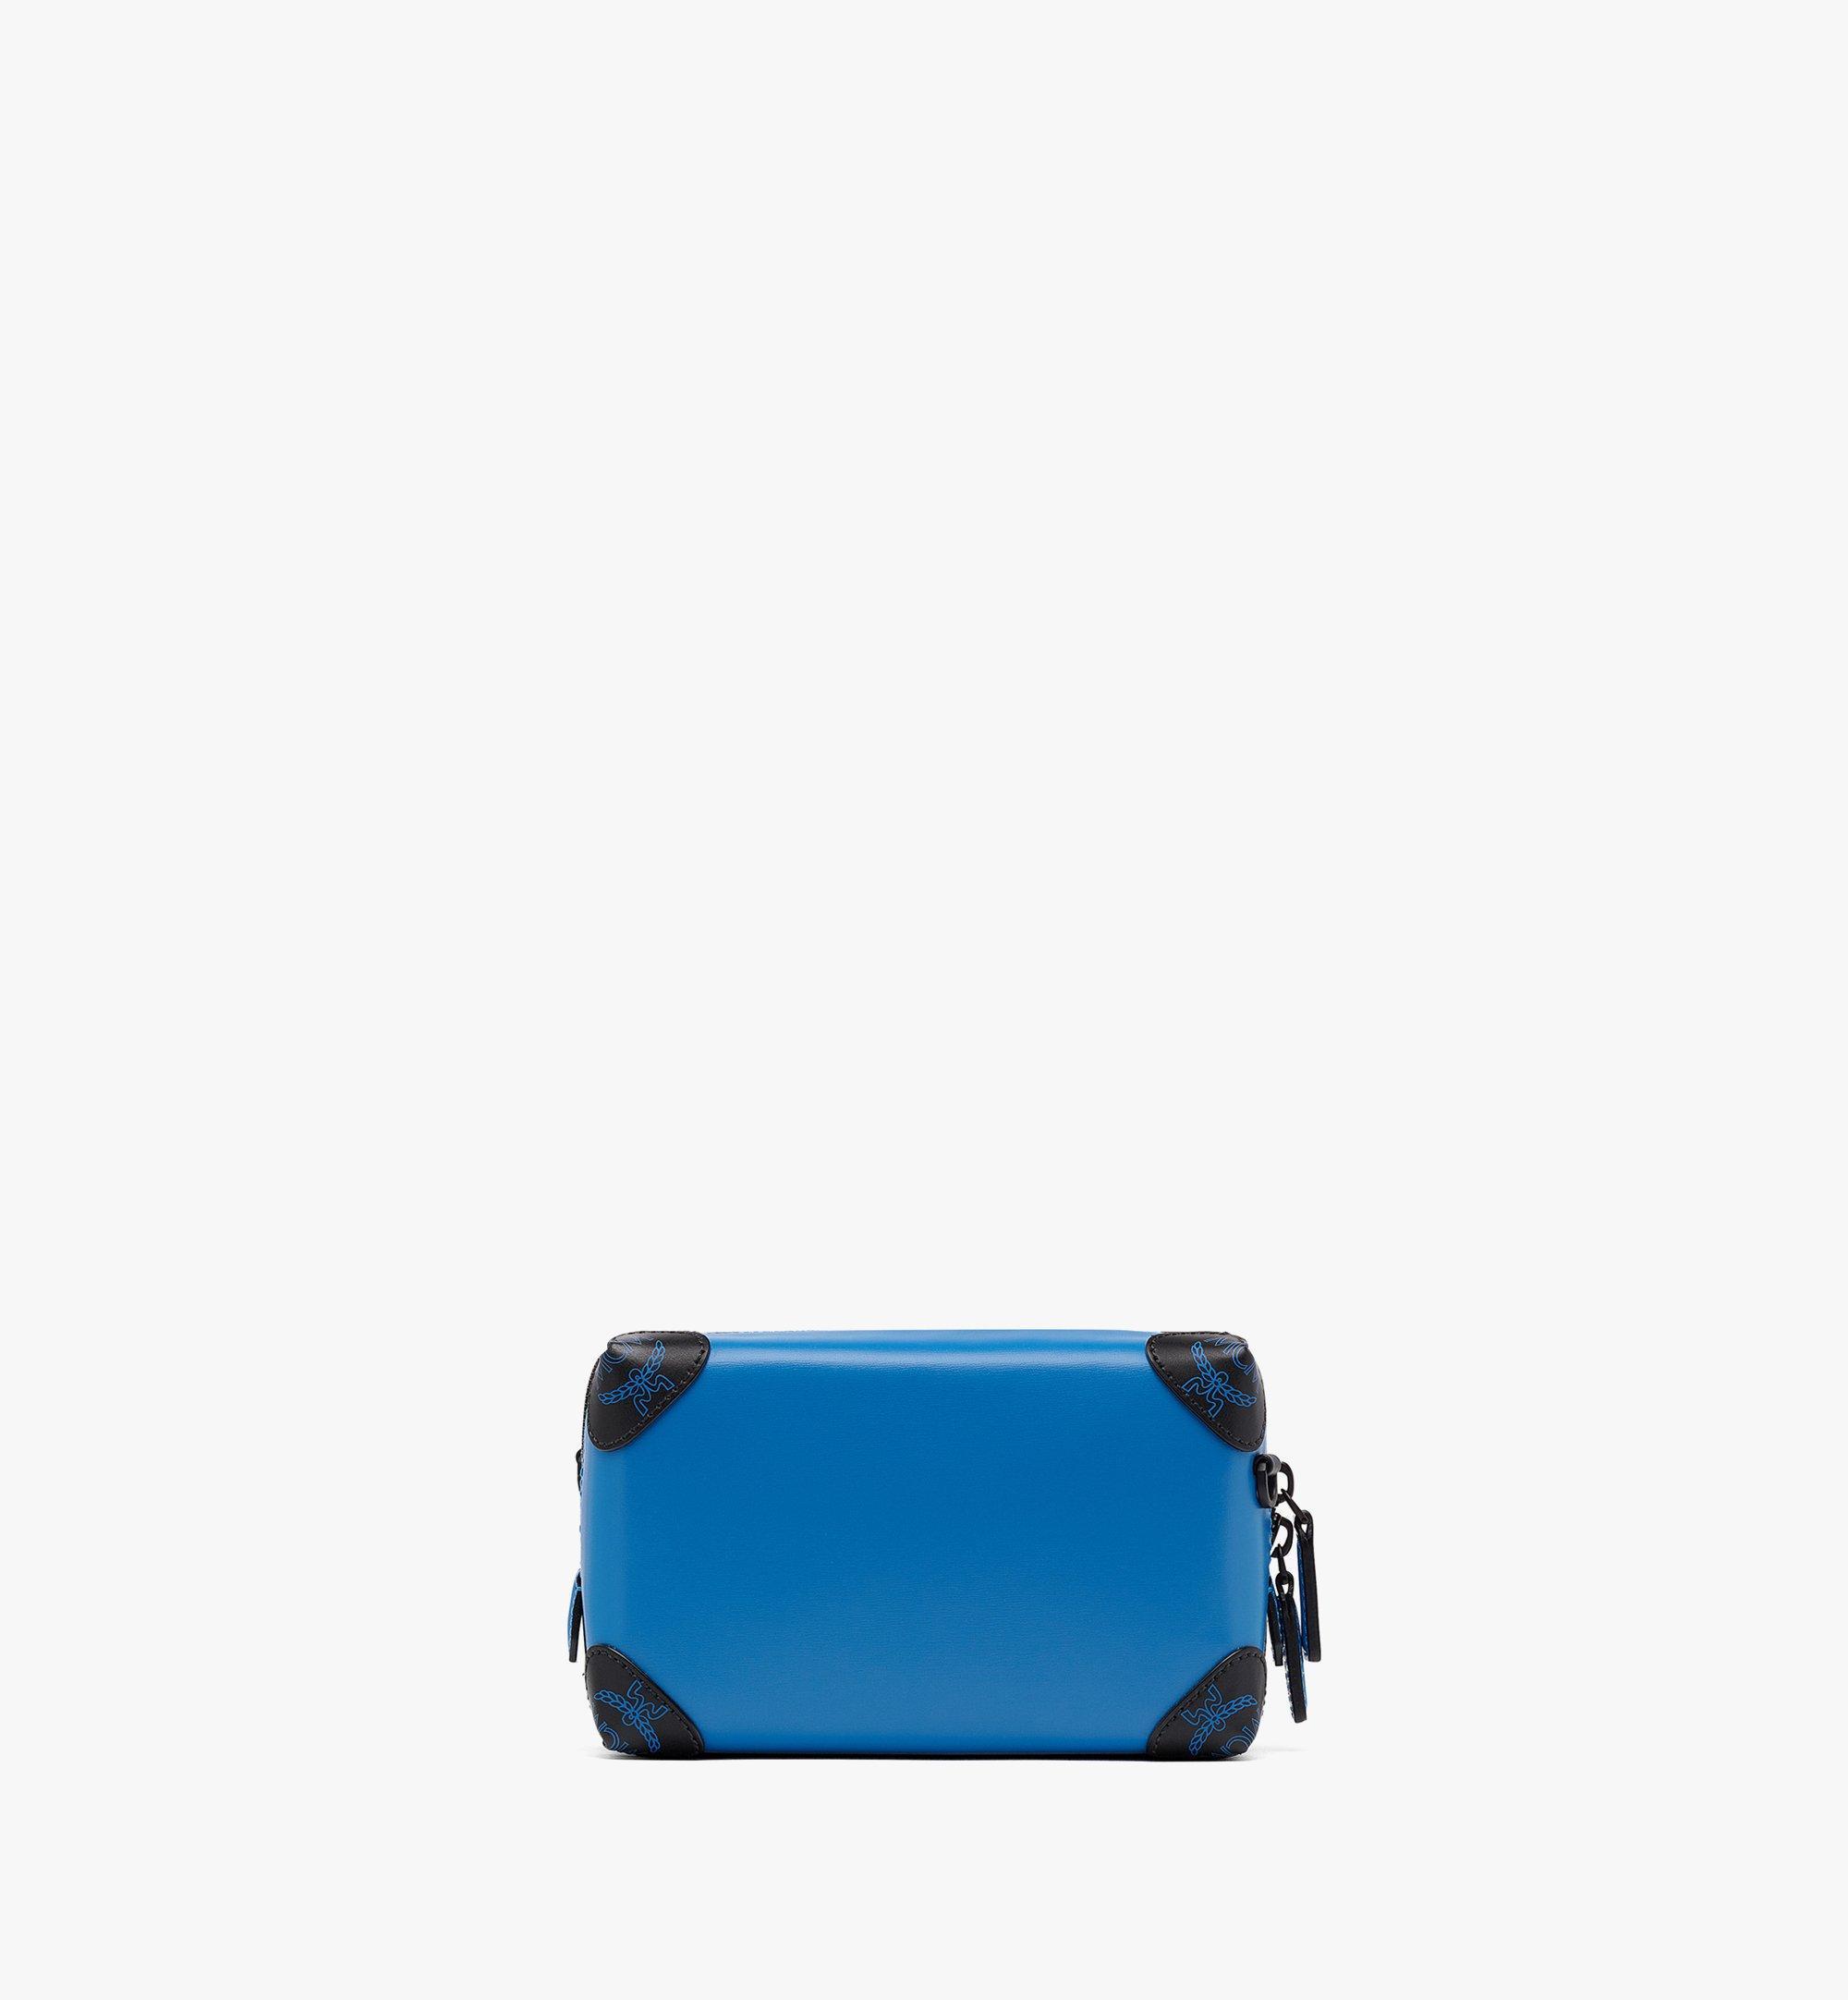 MCM Soft Berlin Crossbody in Spanish Leather Blue MMRBABF01H9001 Alternate View 3